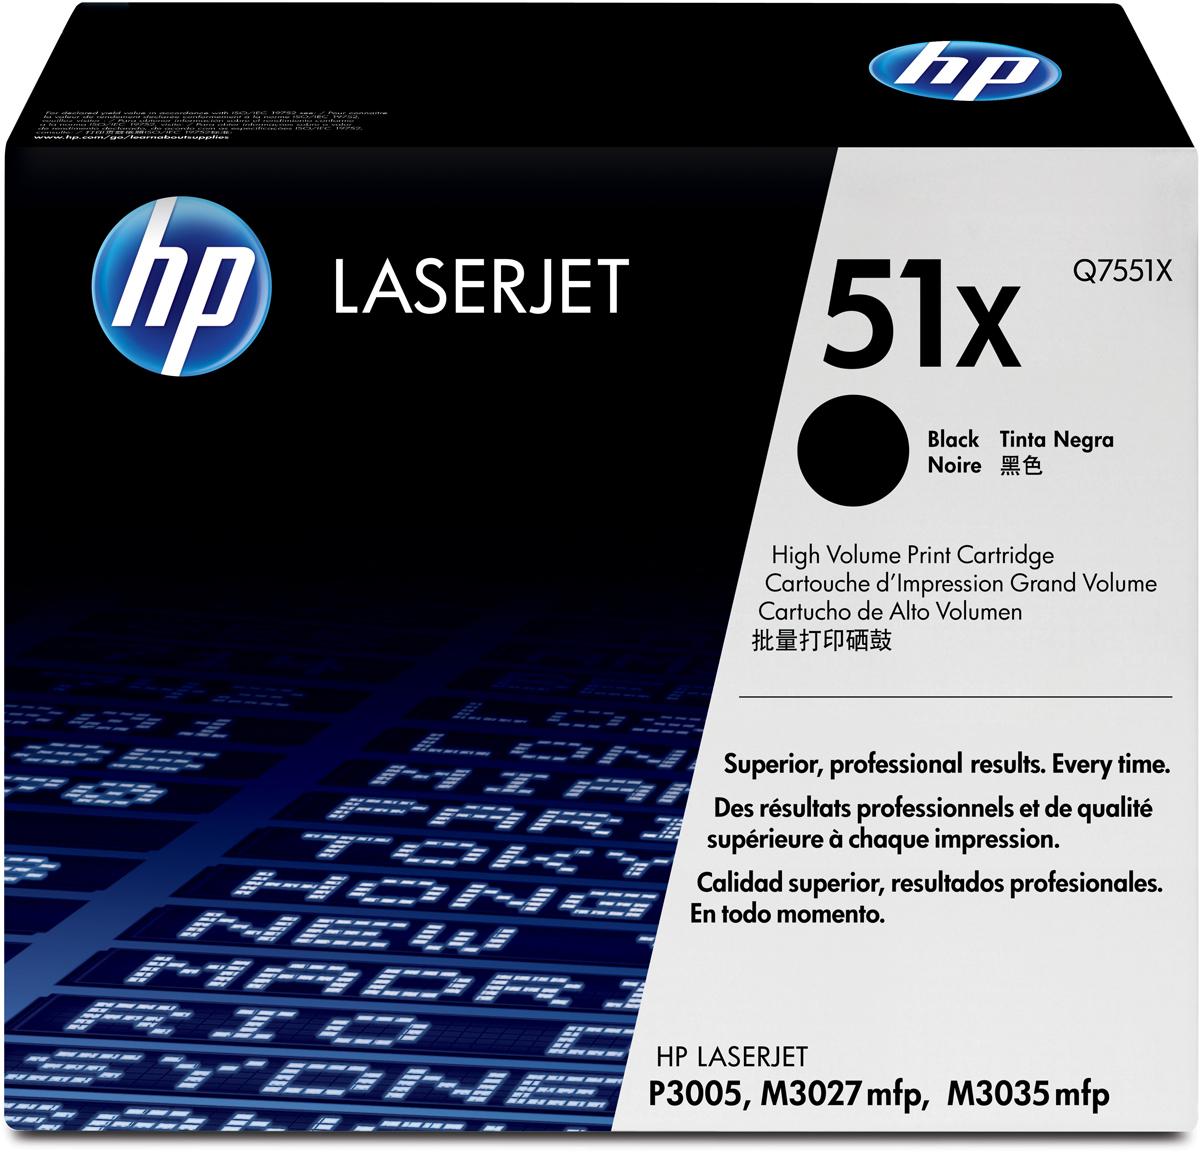 HP Q7551X, Black тонер-картридж для LaserJet P3005/M3035mfp/M3027mfp hp x900 wired mouse black ð¼ñ‹ñˆñŒ